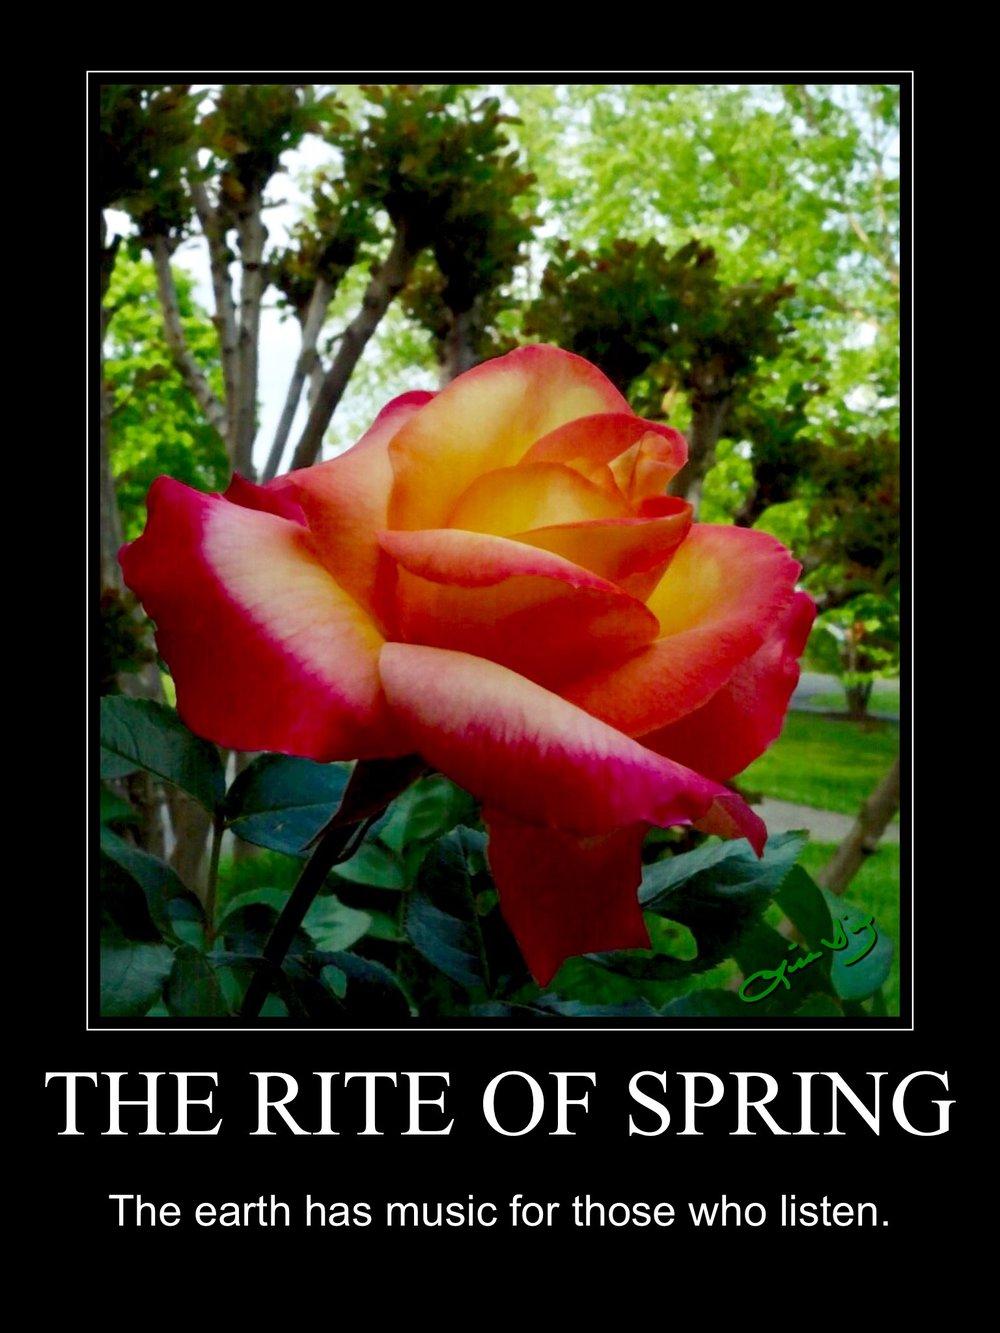 rite of spring.JPG